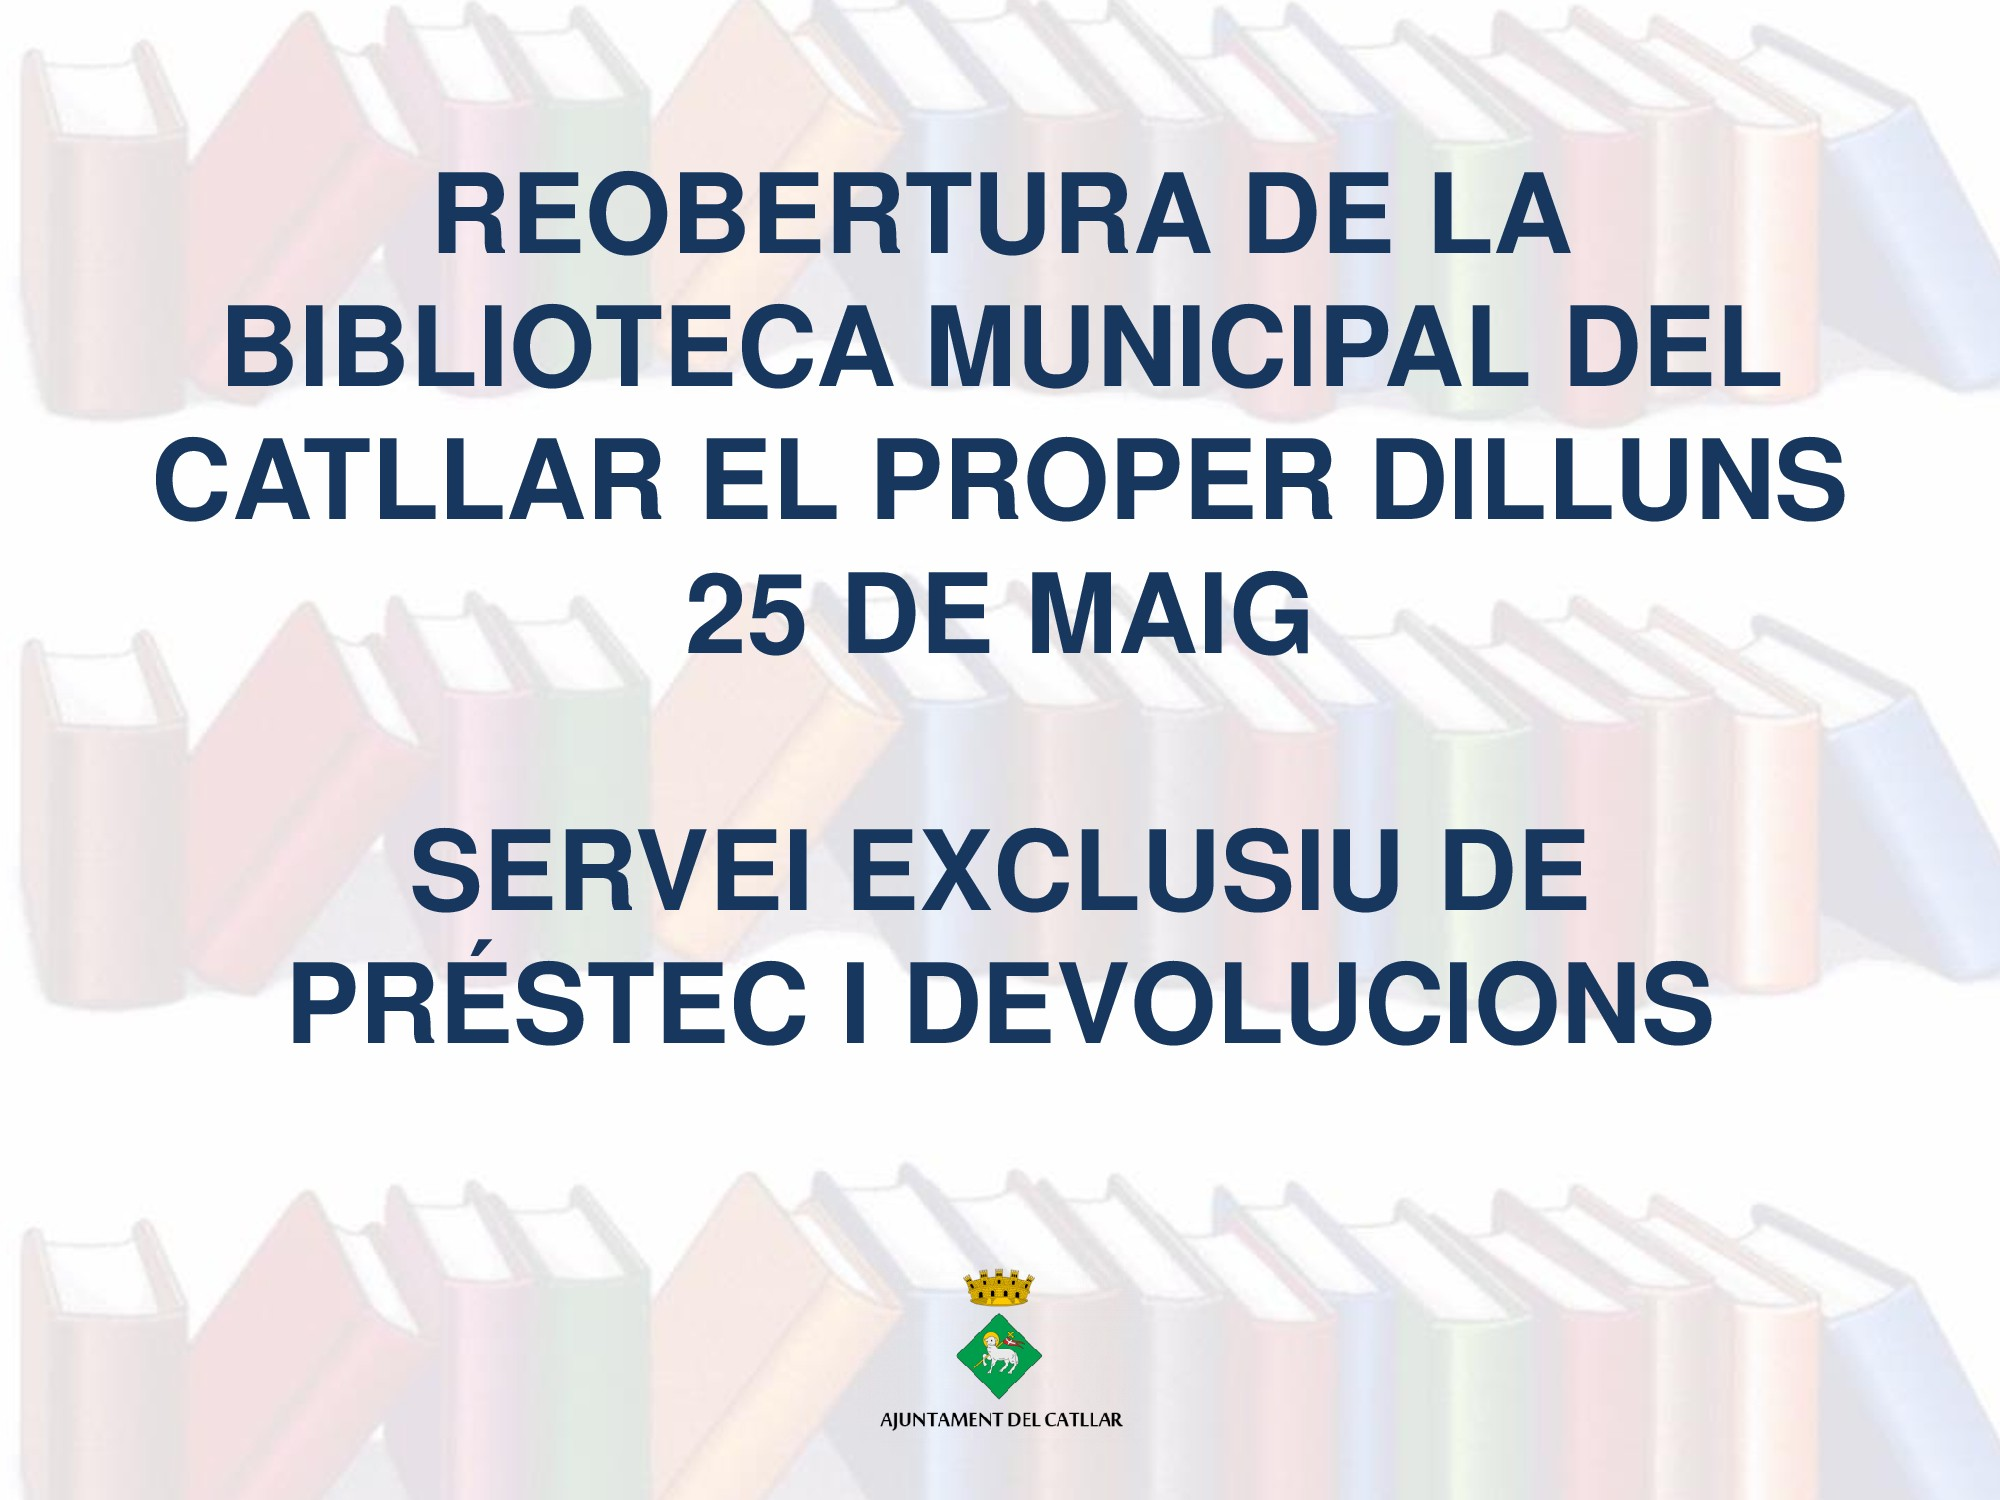 REOBERTURA BIBLIOTECA MUNICIPAL DEL CATLLAR